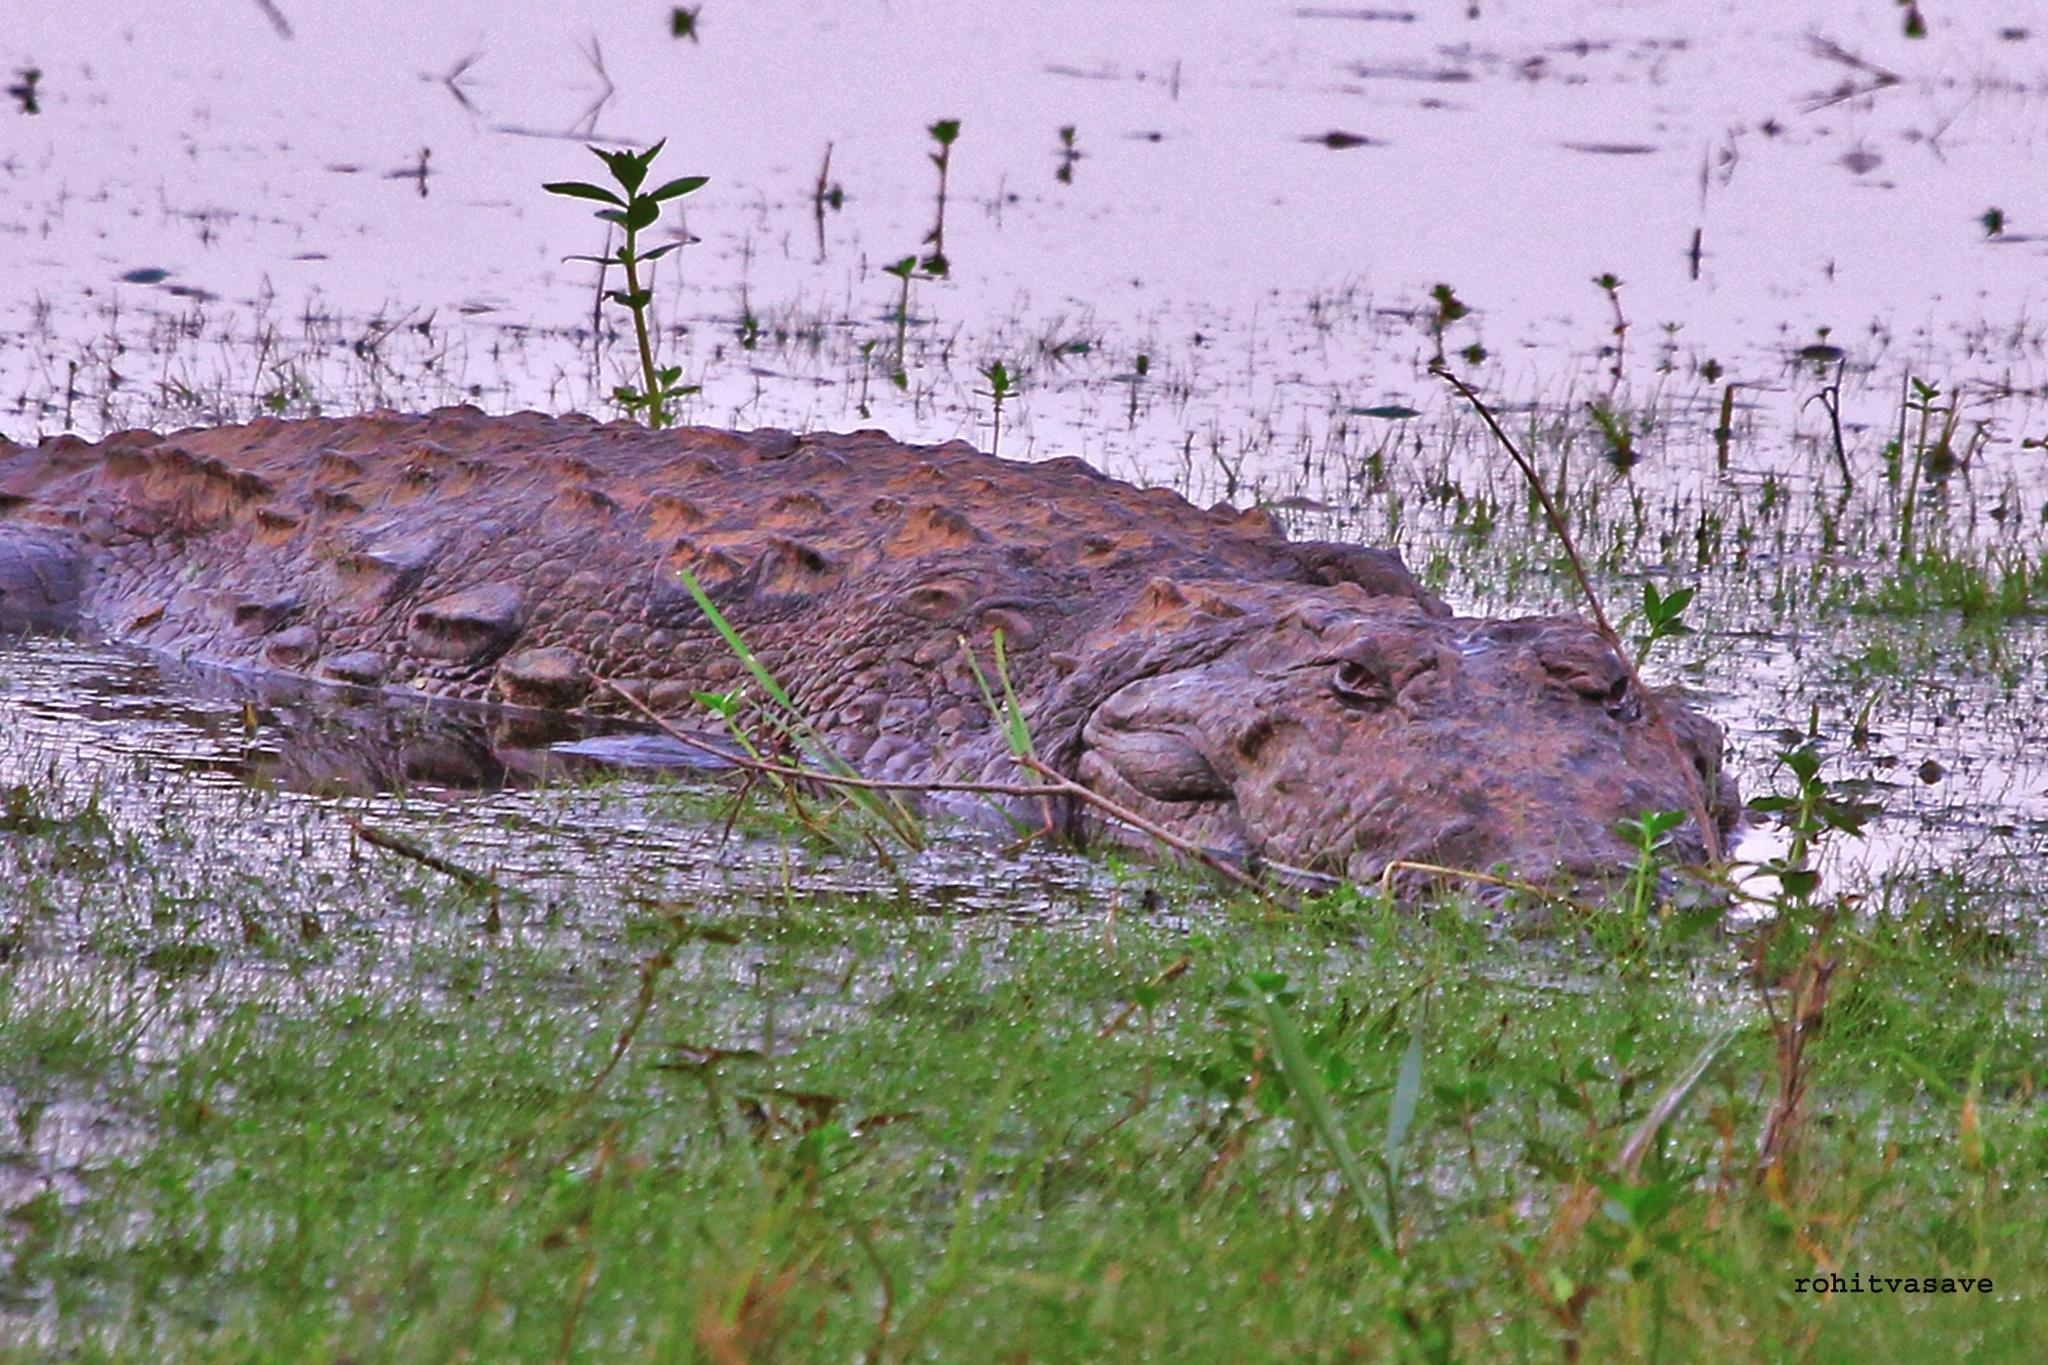 Crocodile .... by rohitvasave